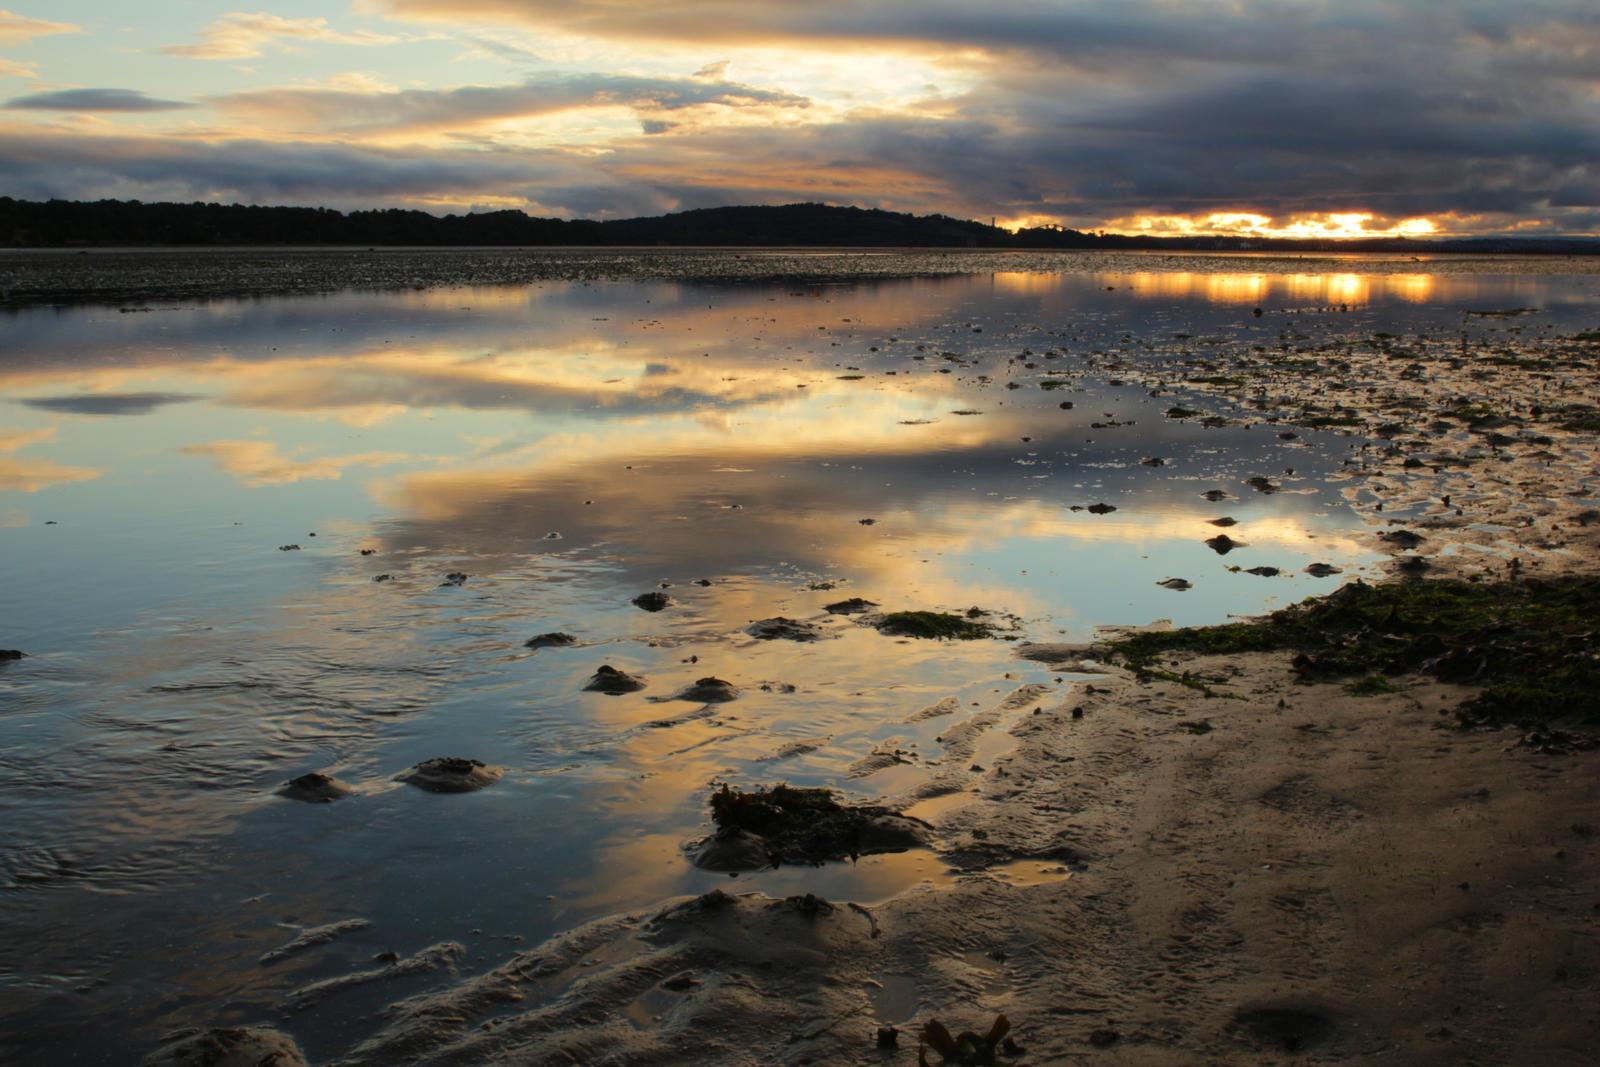 Edinburgh Sundown at the bay by LoveForDetails